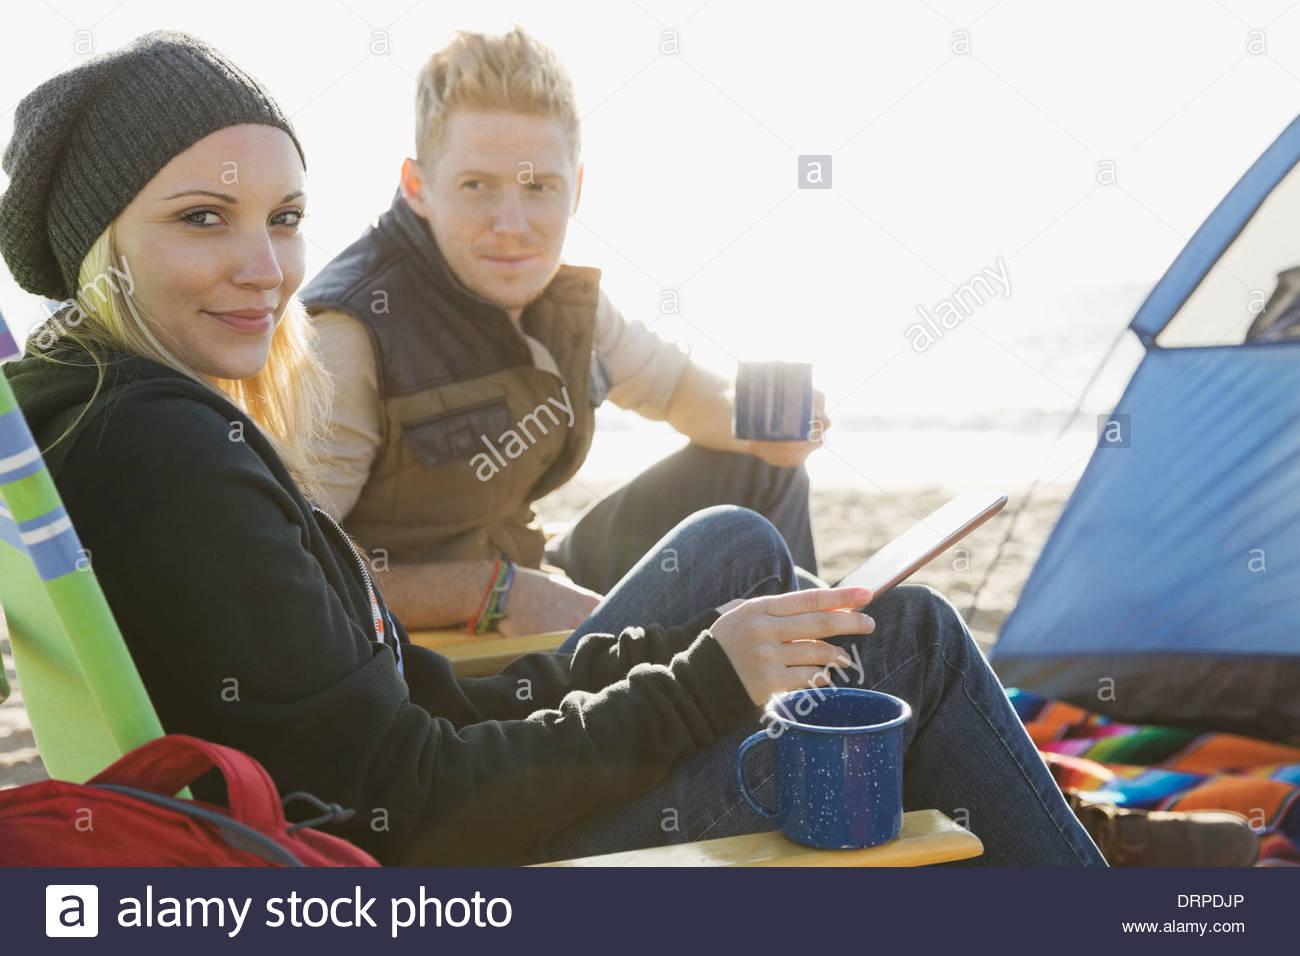 Par acampar en la playa Imagen De Stock